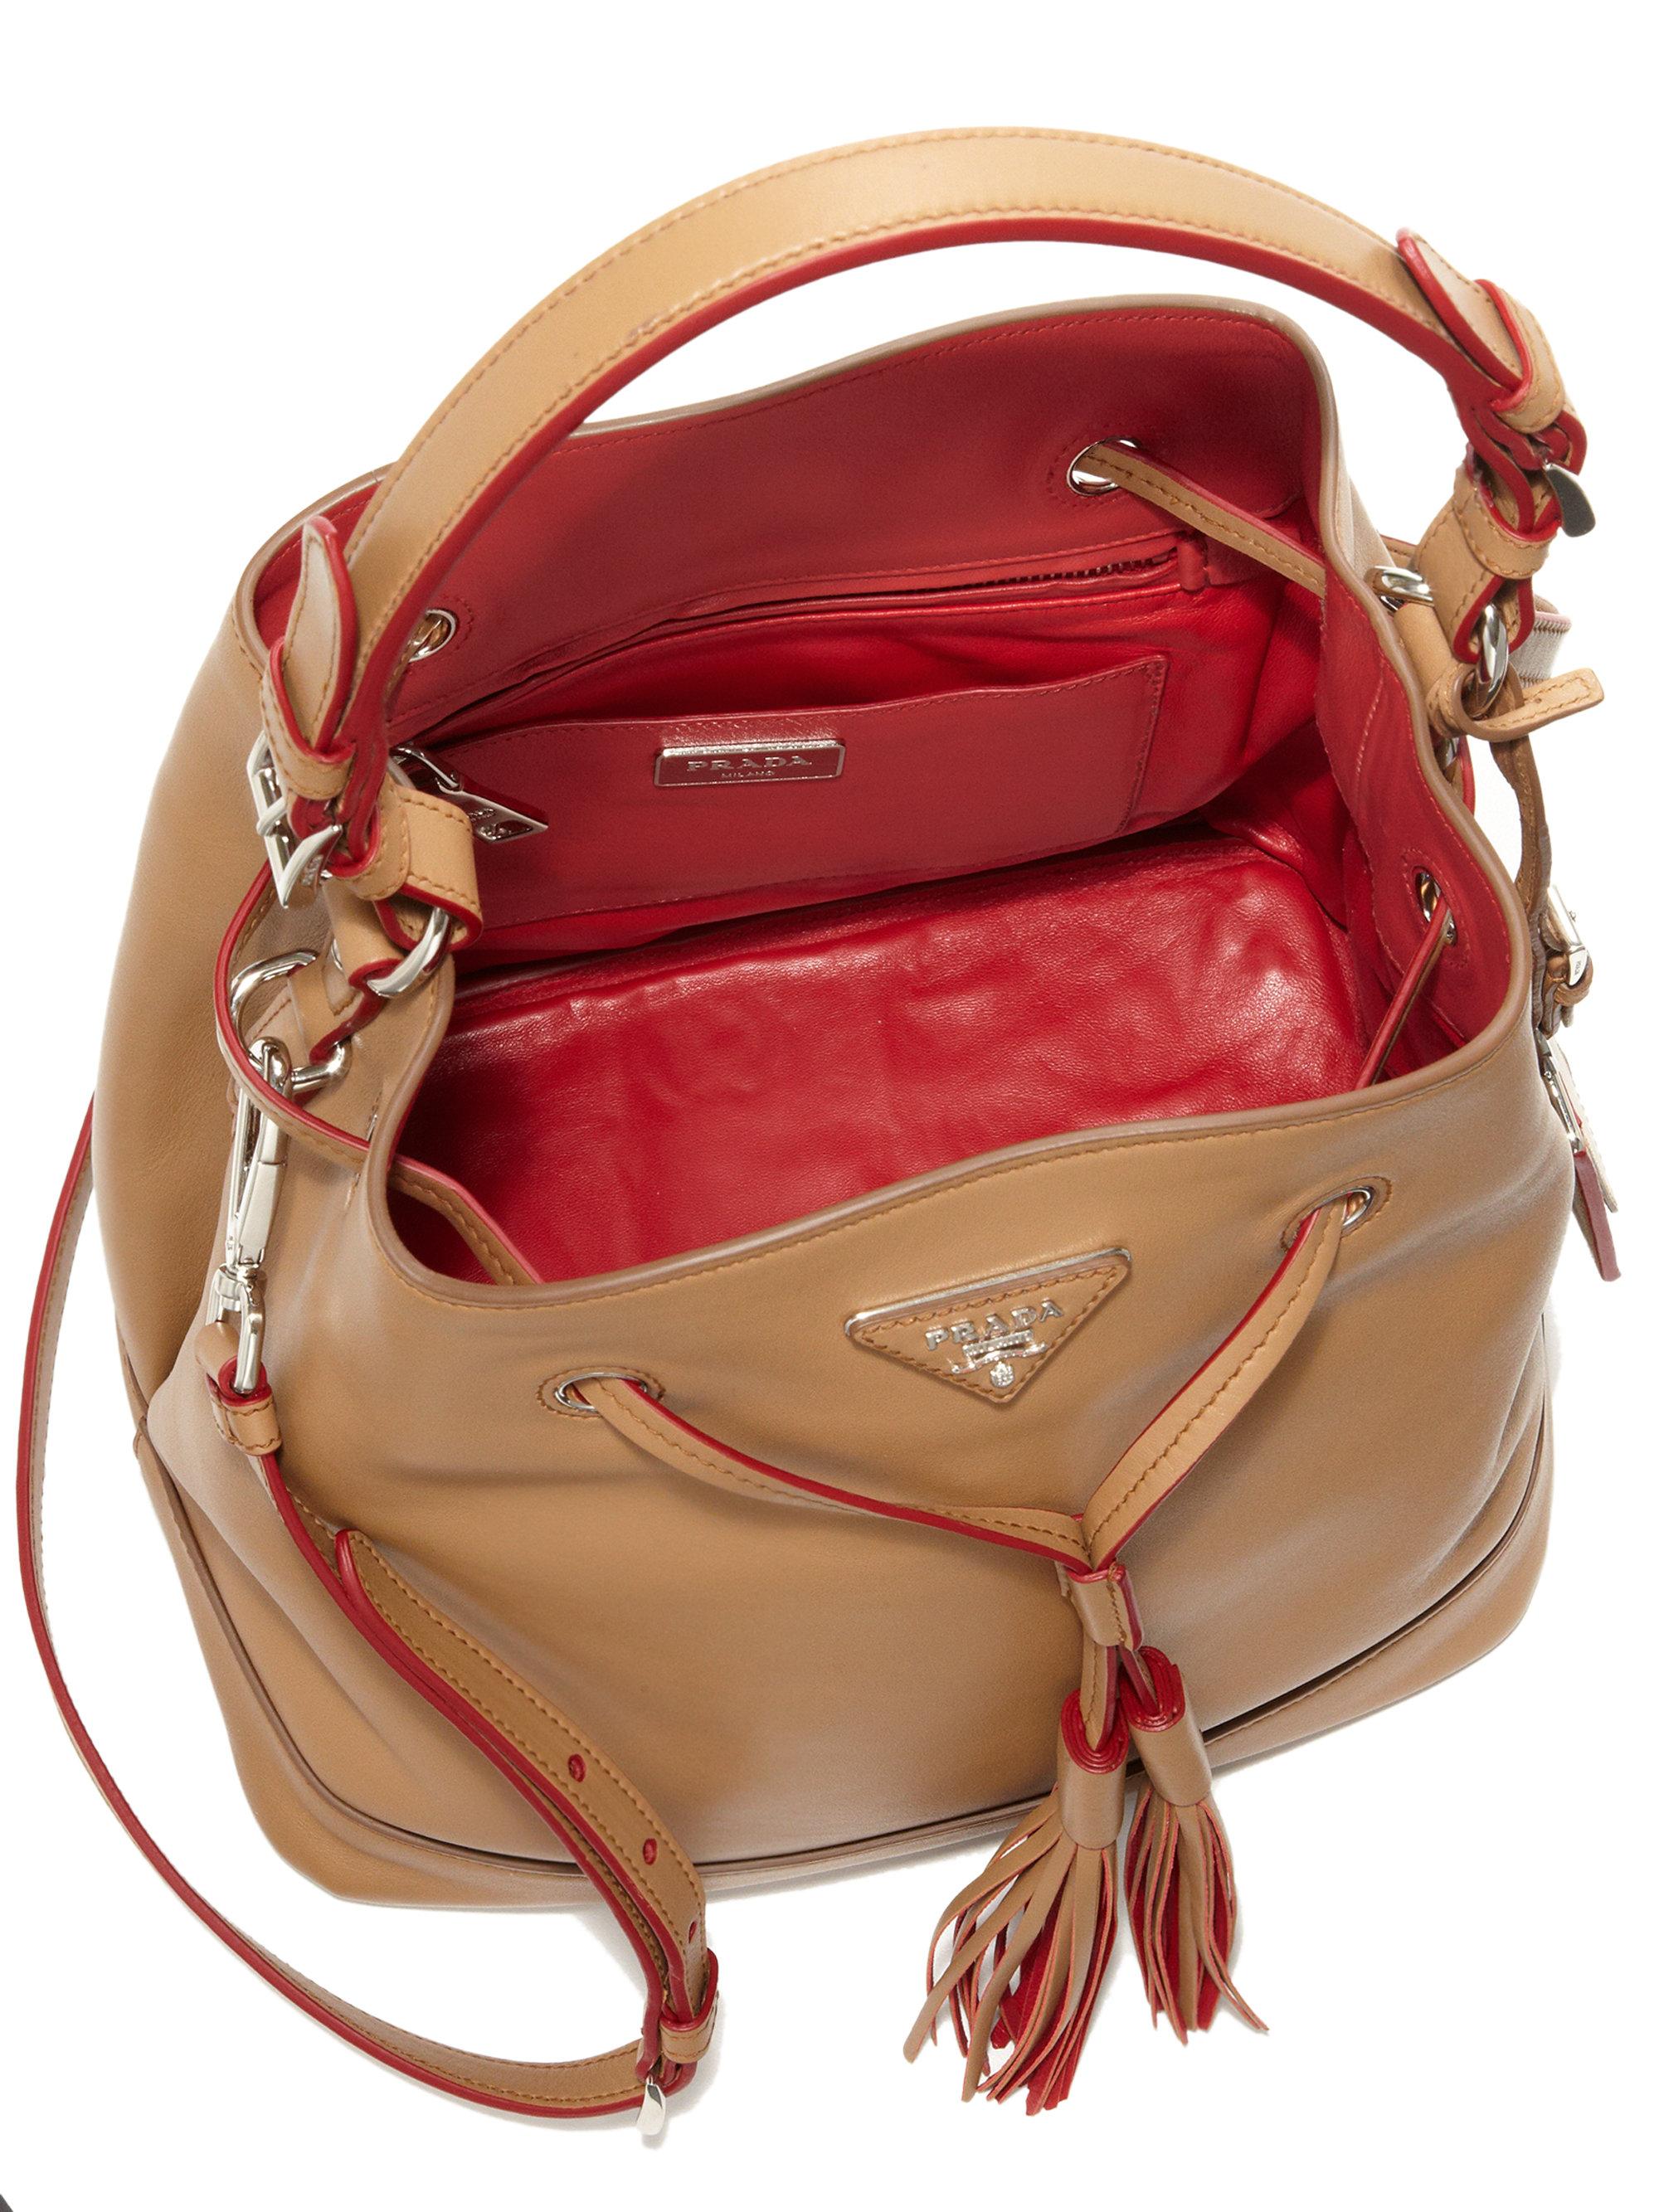 Bag At You Fashion Blog Hip E Bags White Backpack: Prada Large Bucket Bag In Brown